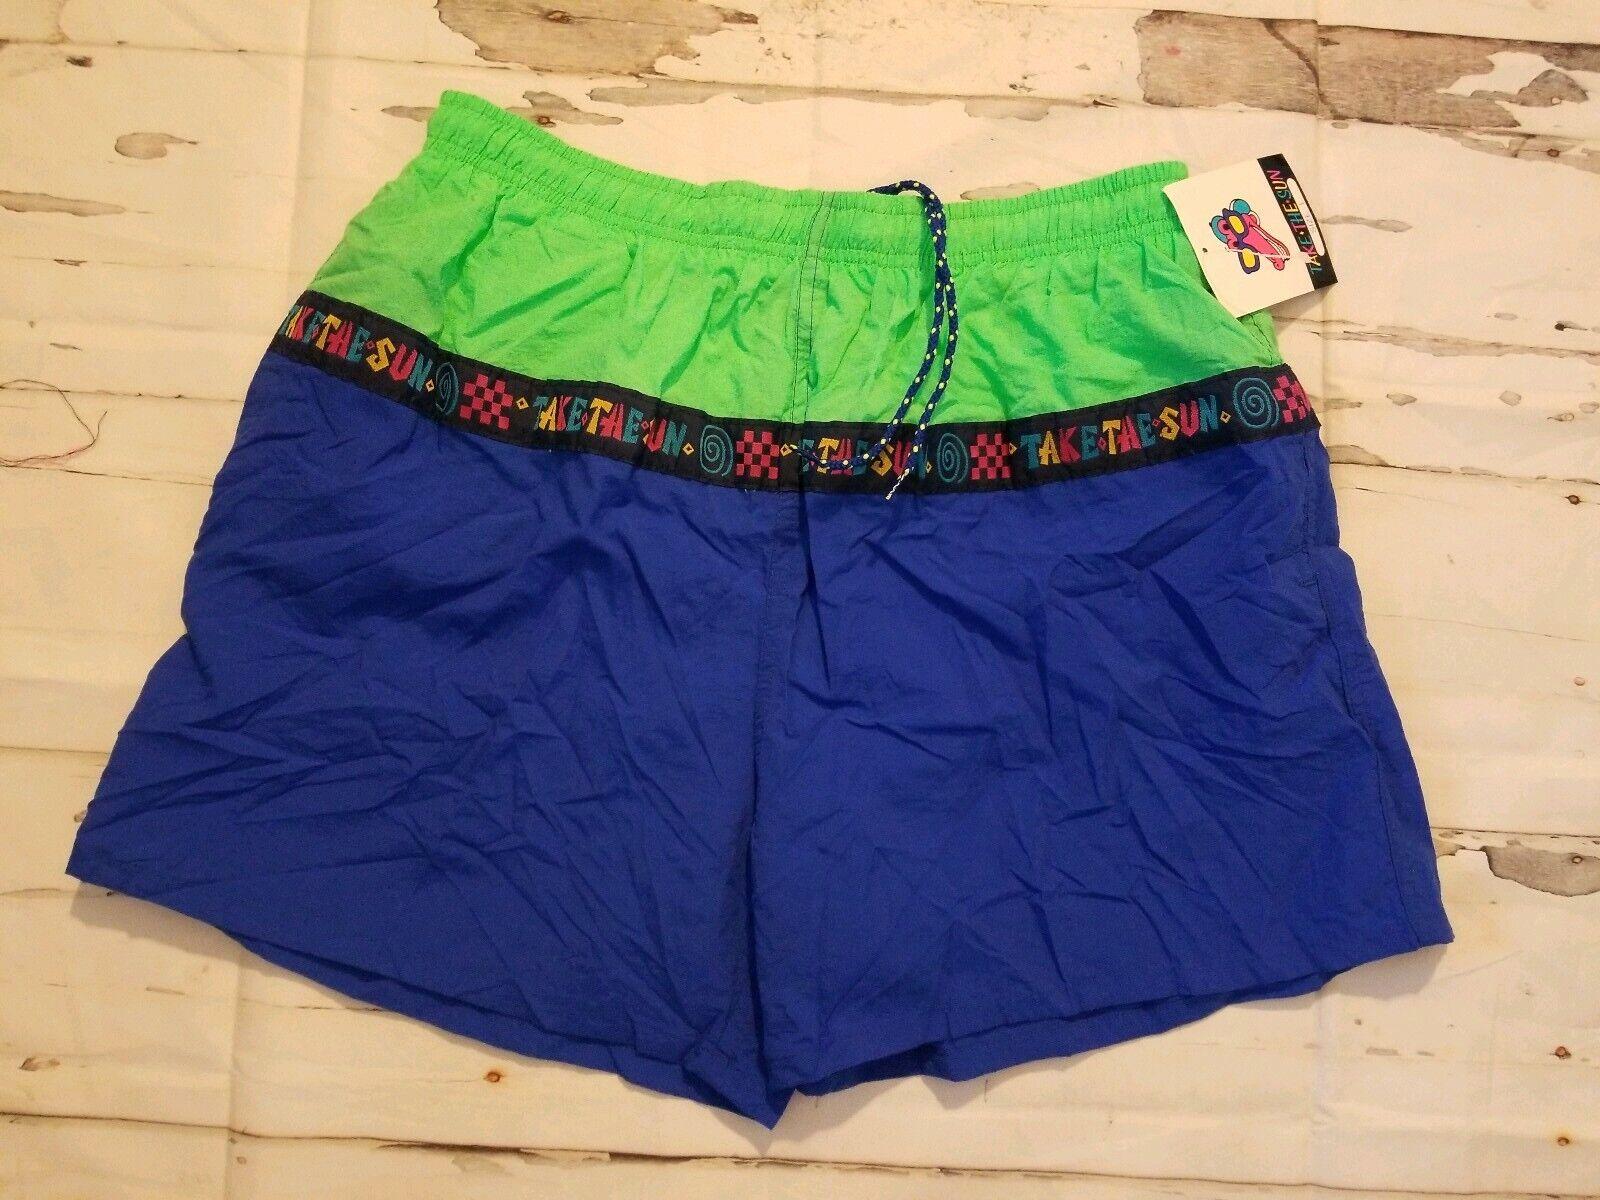 Vtg 90s Color Block Take the Sun Funky Swim Trunks Baggies Shorts NWT L Retro